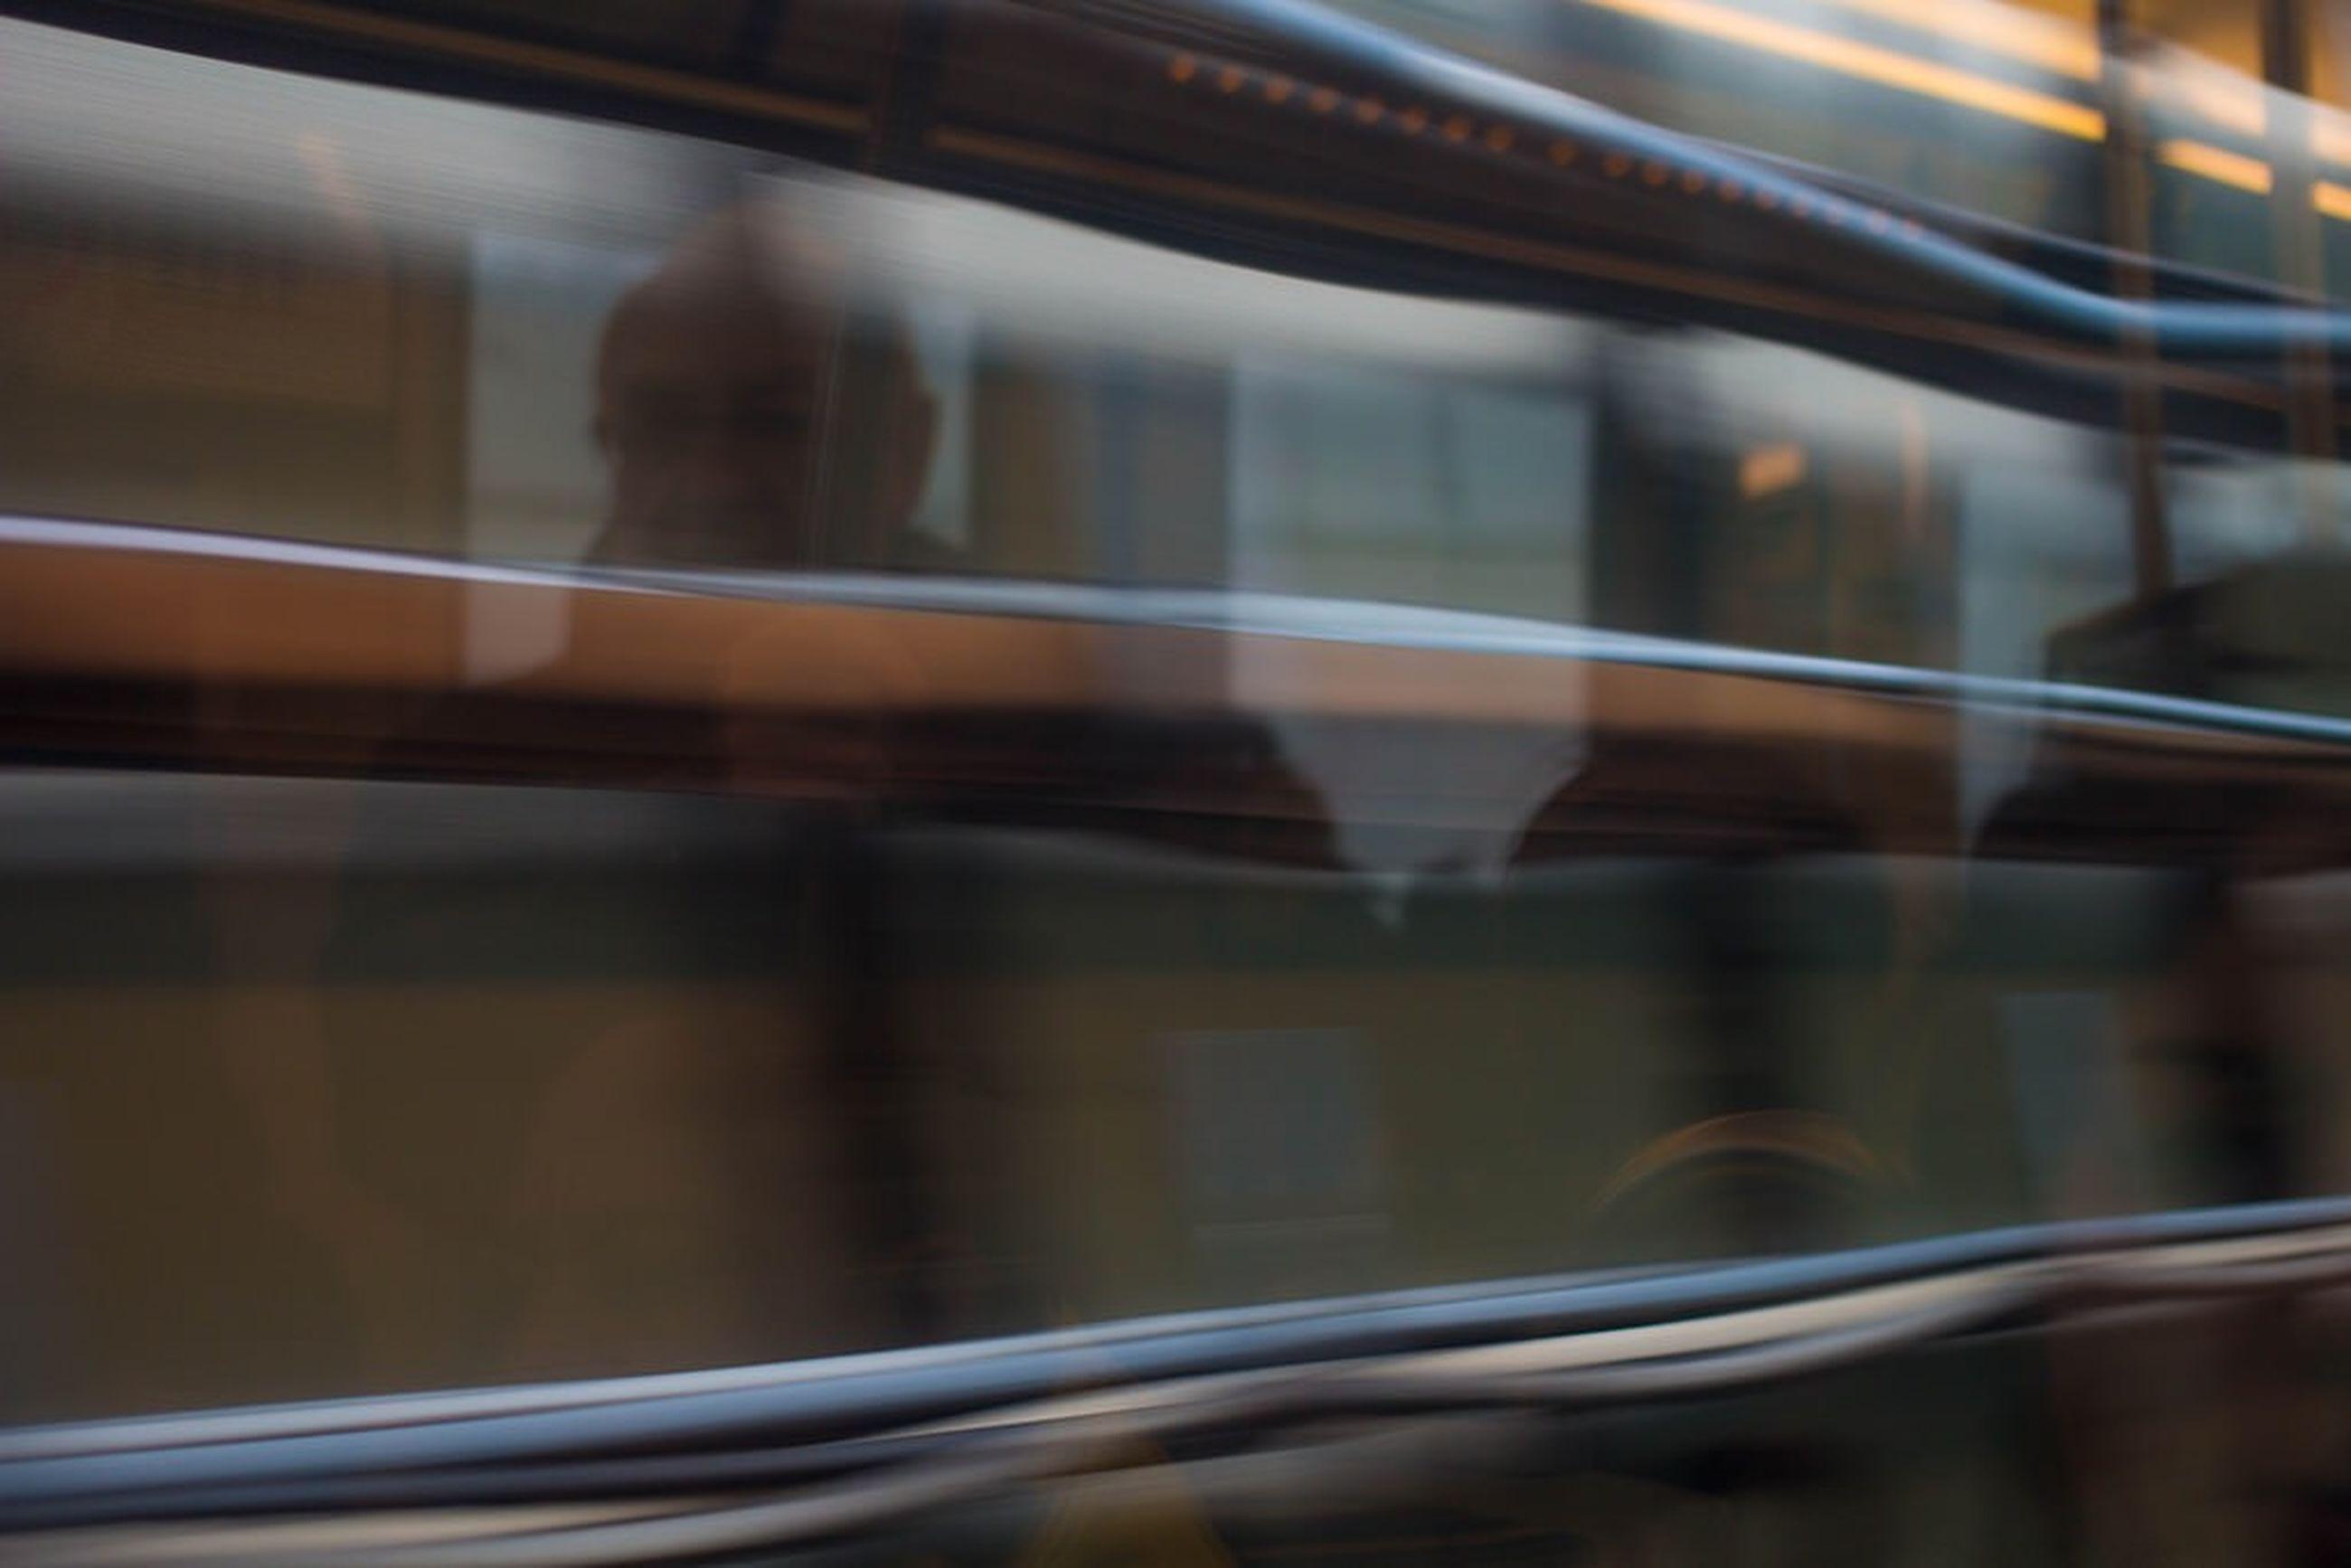 blurred motion, transportation, motion, indoors, public transportation, speed, reflection, rail transportation, train - vehicle, selective focus, on the move, long exposure, railroad track, mode of transport, glass - material, window, transparent, railroad station platform, train